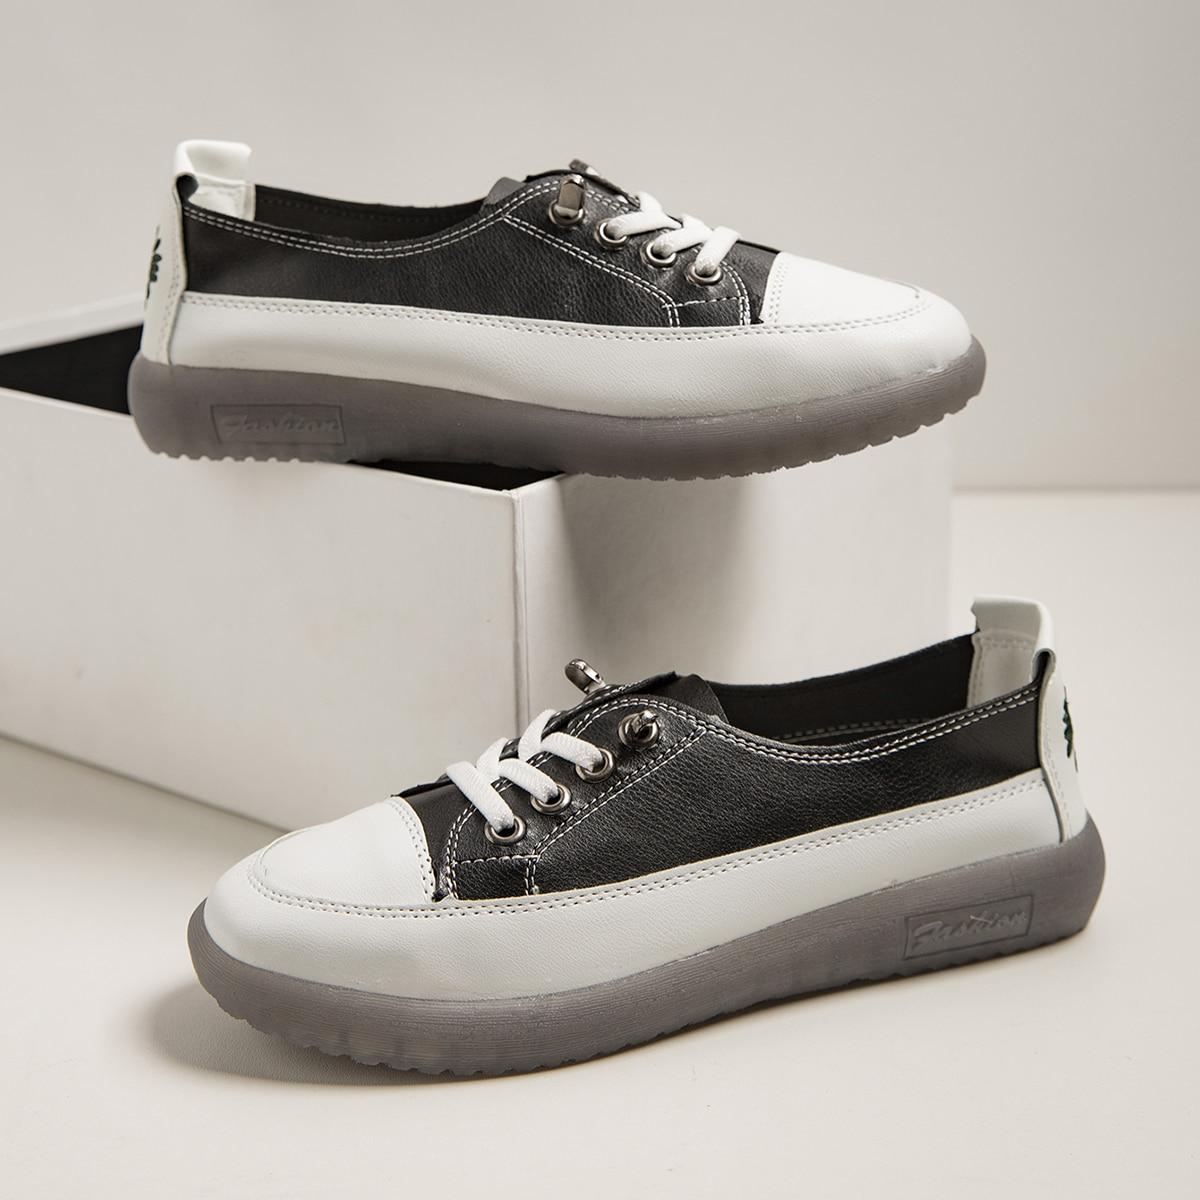 shein Kant Preppy Kleurblok Sneaker Borduurwerk